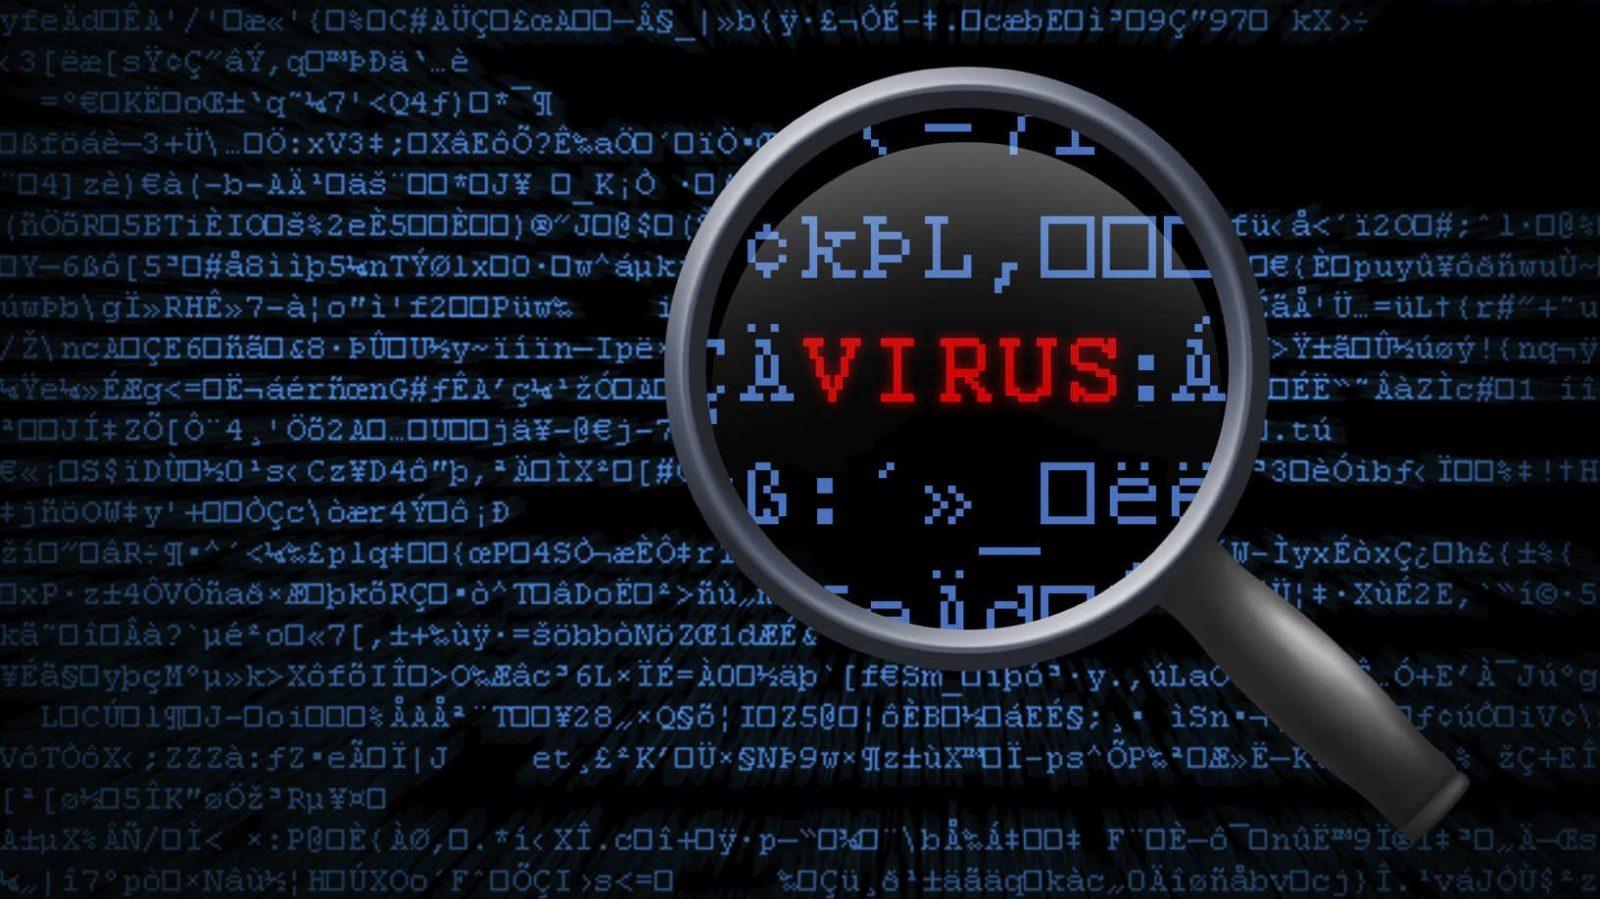 Защищаемся без антивируса #2. Работаем руками